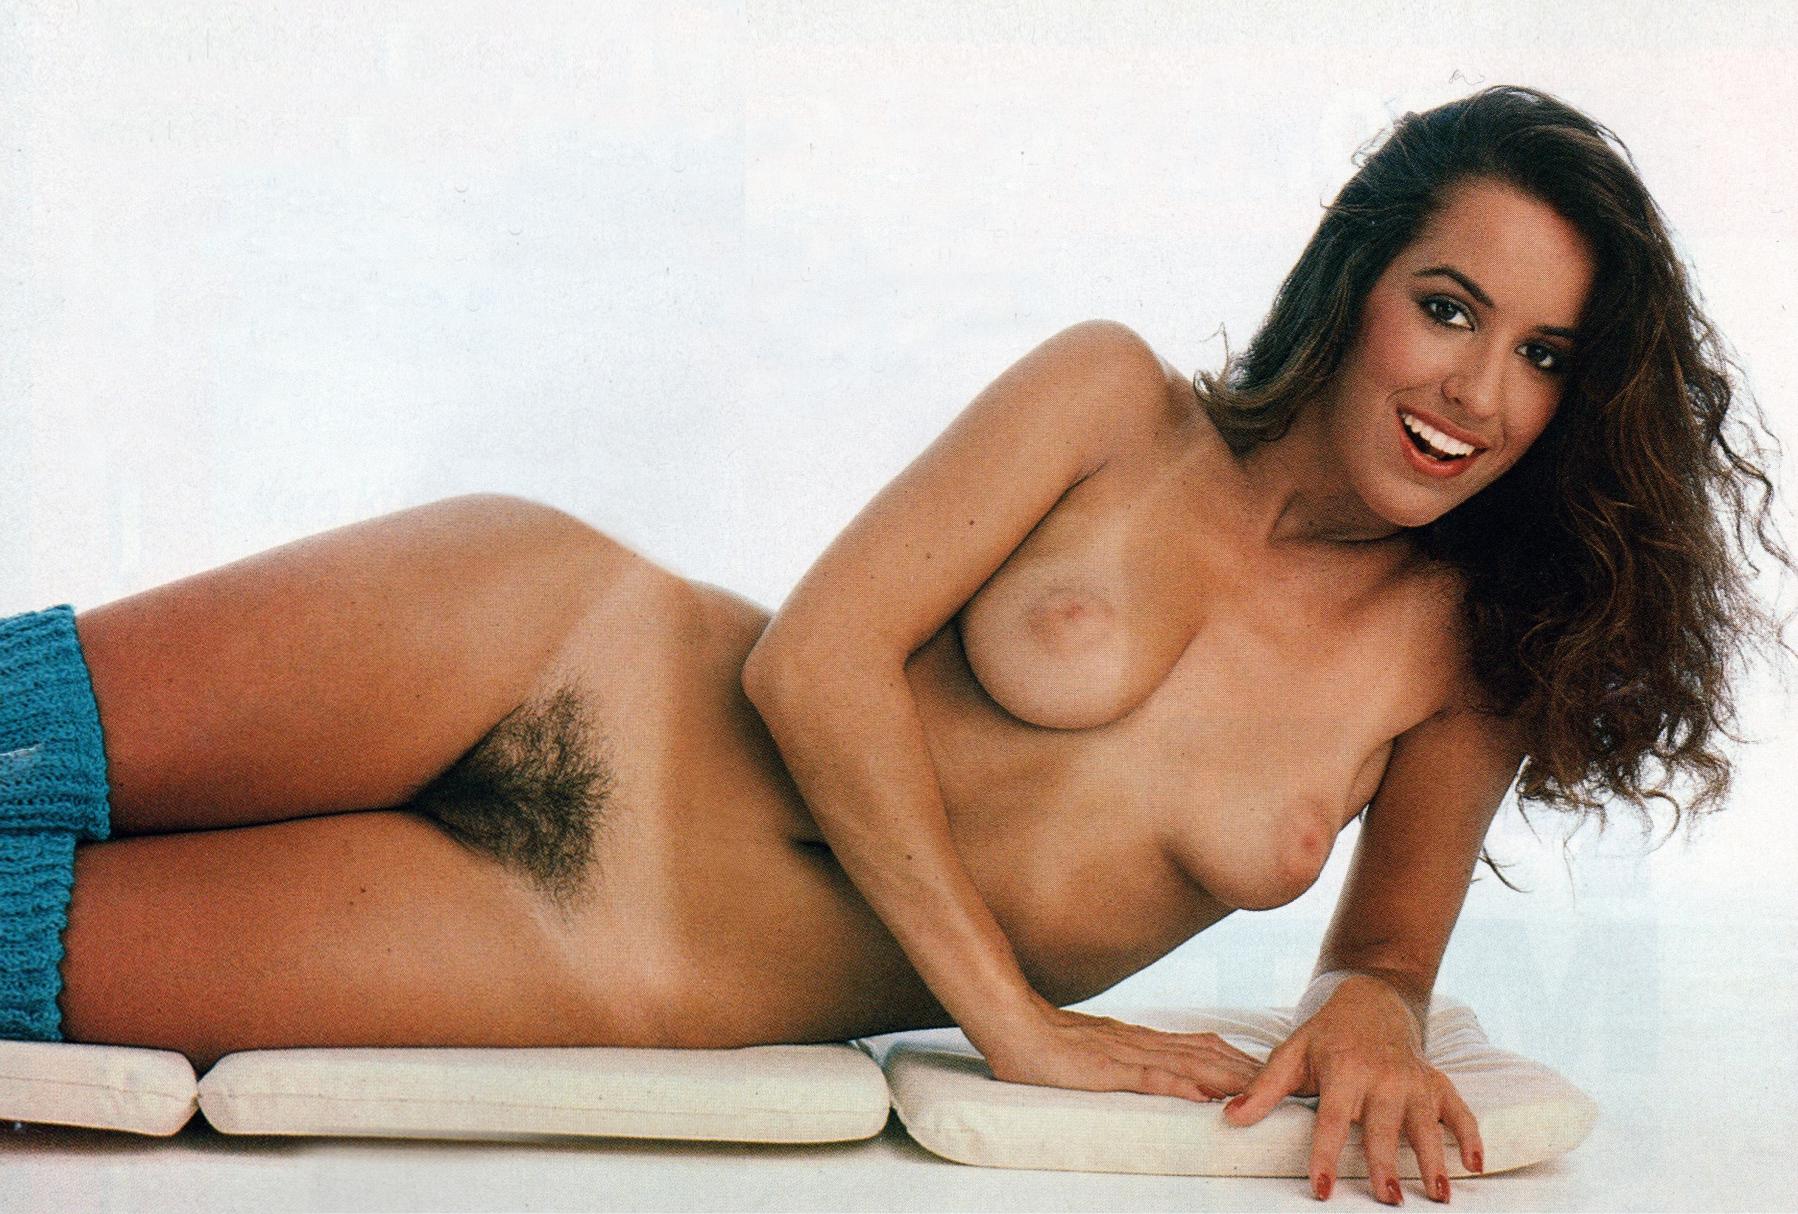 Pornstar Tina Ross aka Lauren Wilde 07.jpg